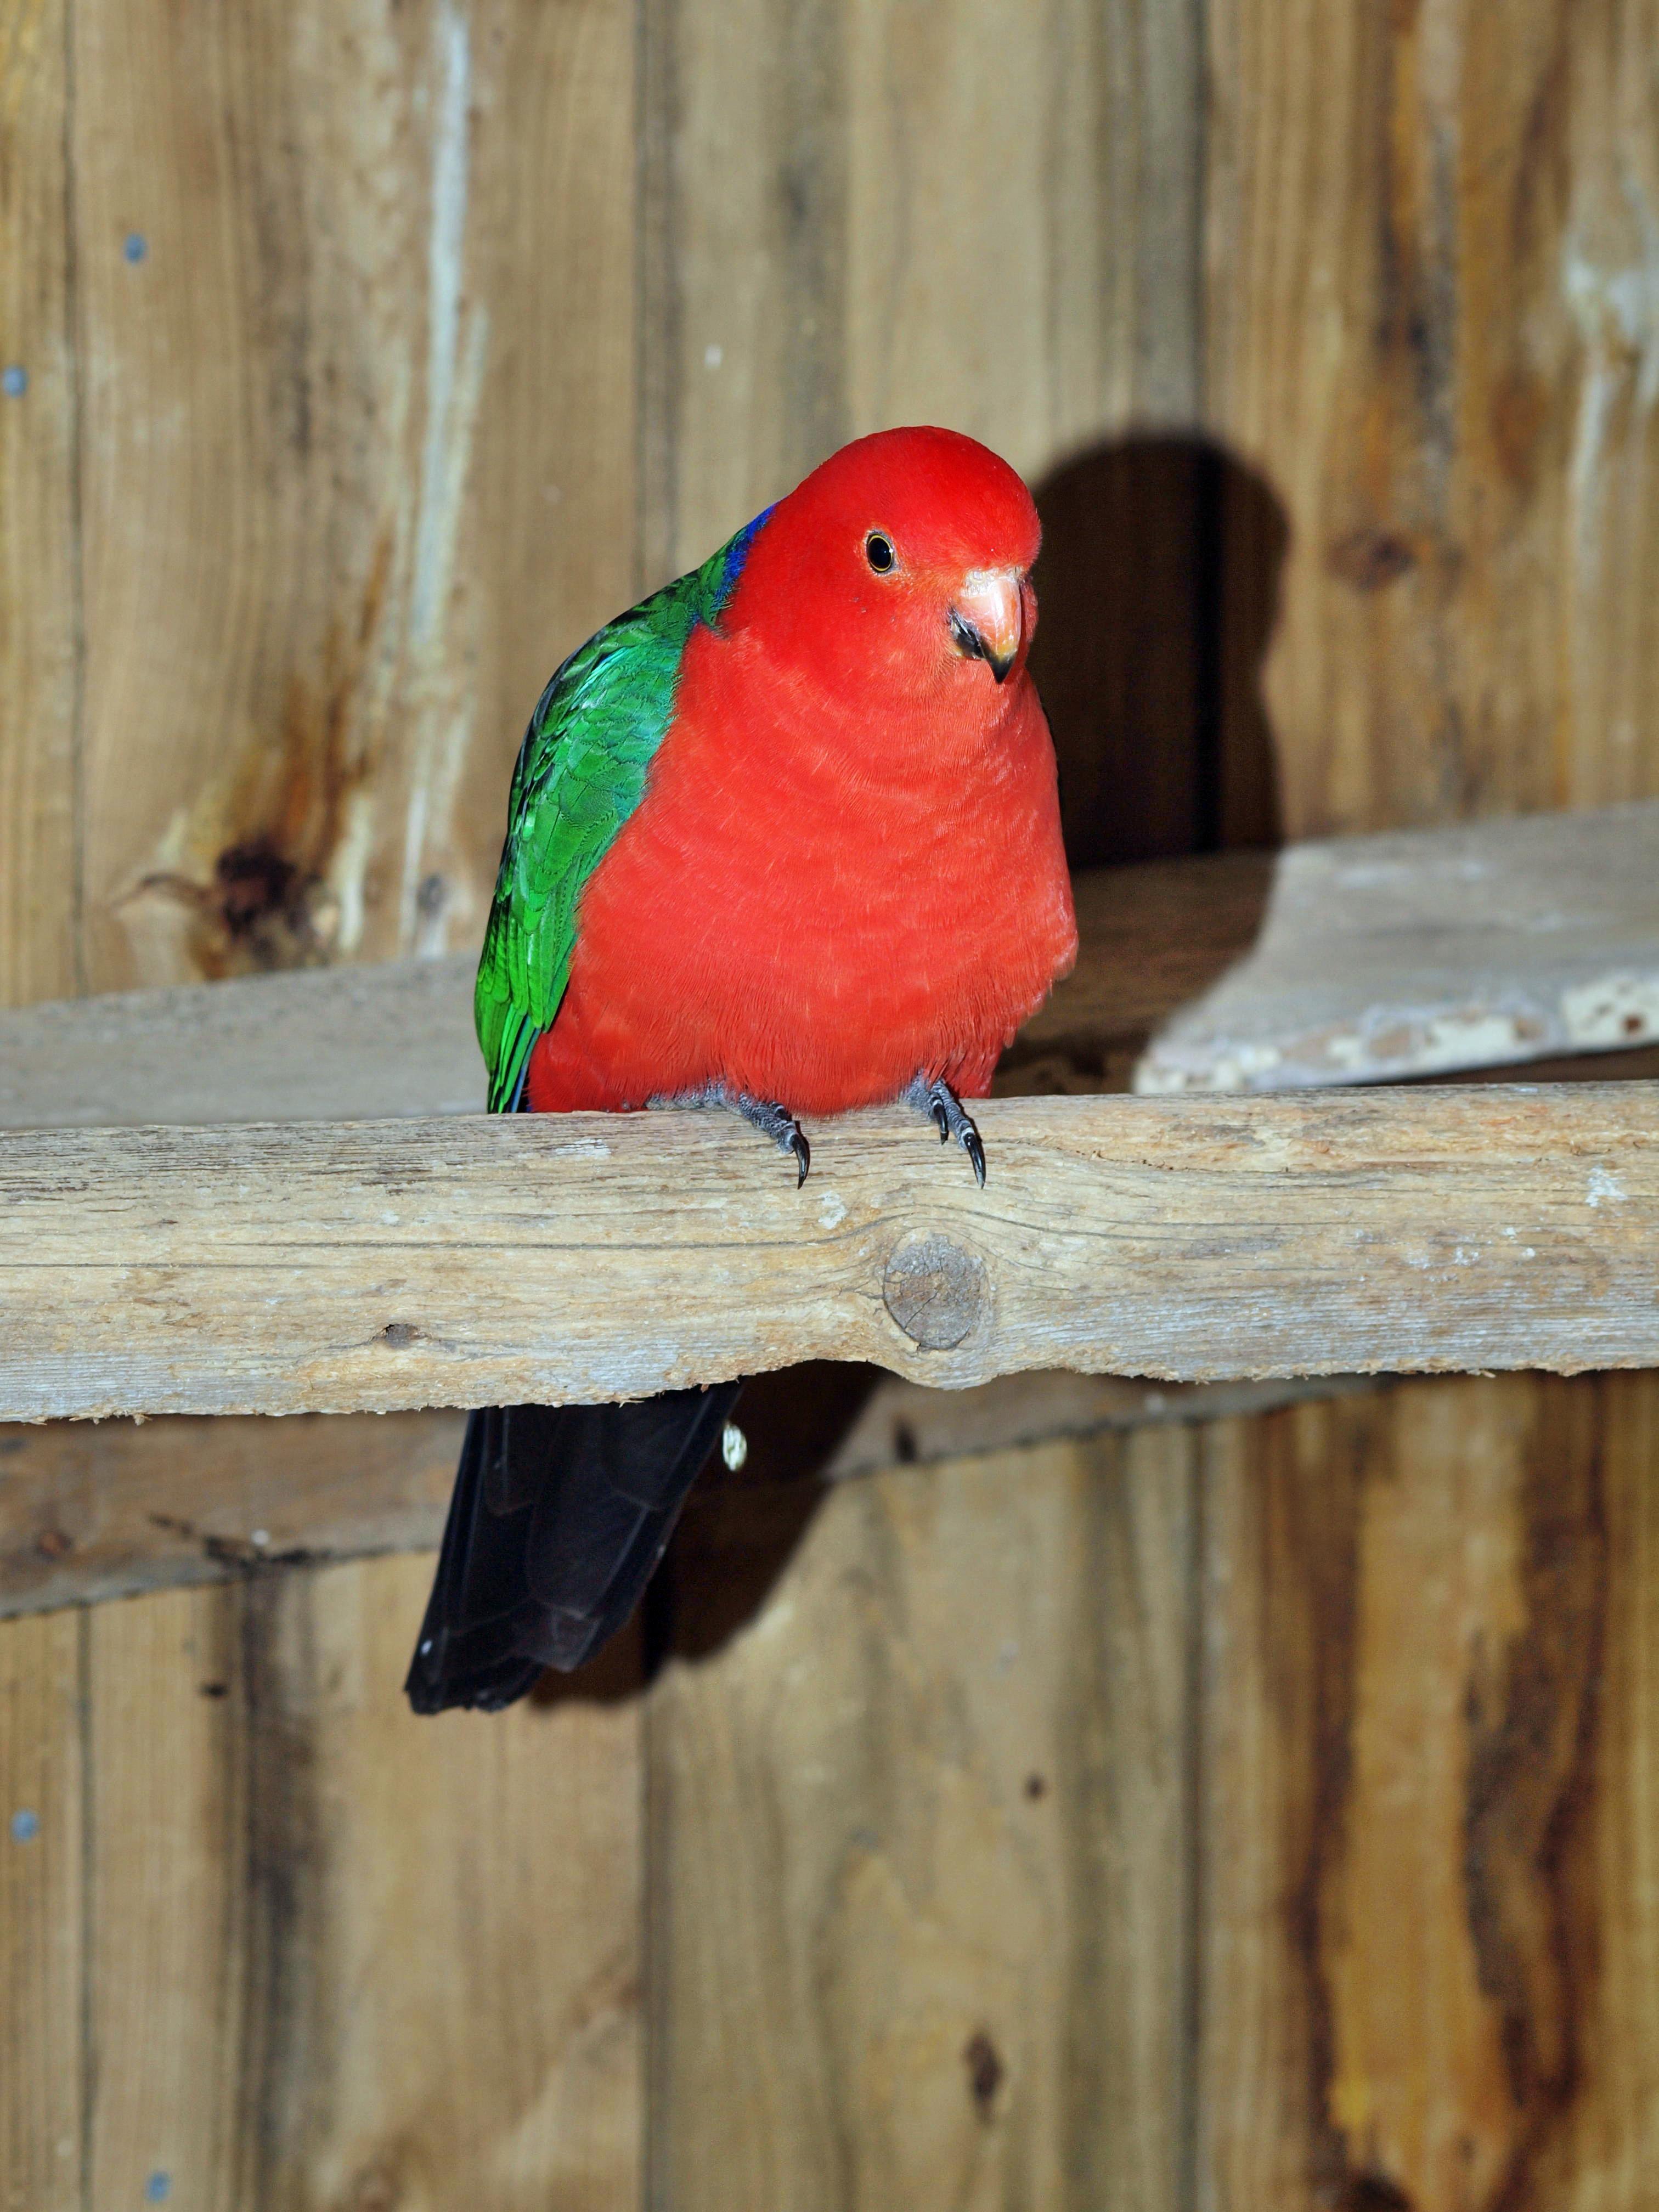 Parrot-14.jpeg